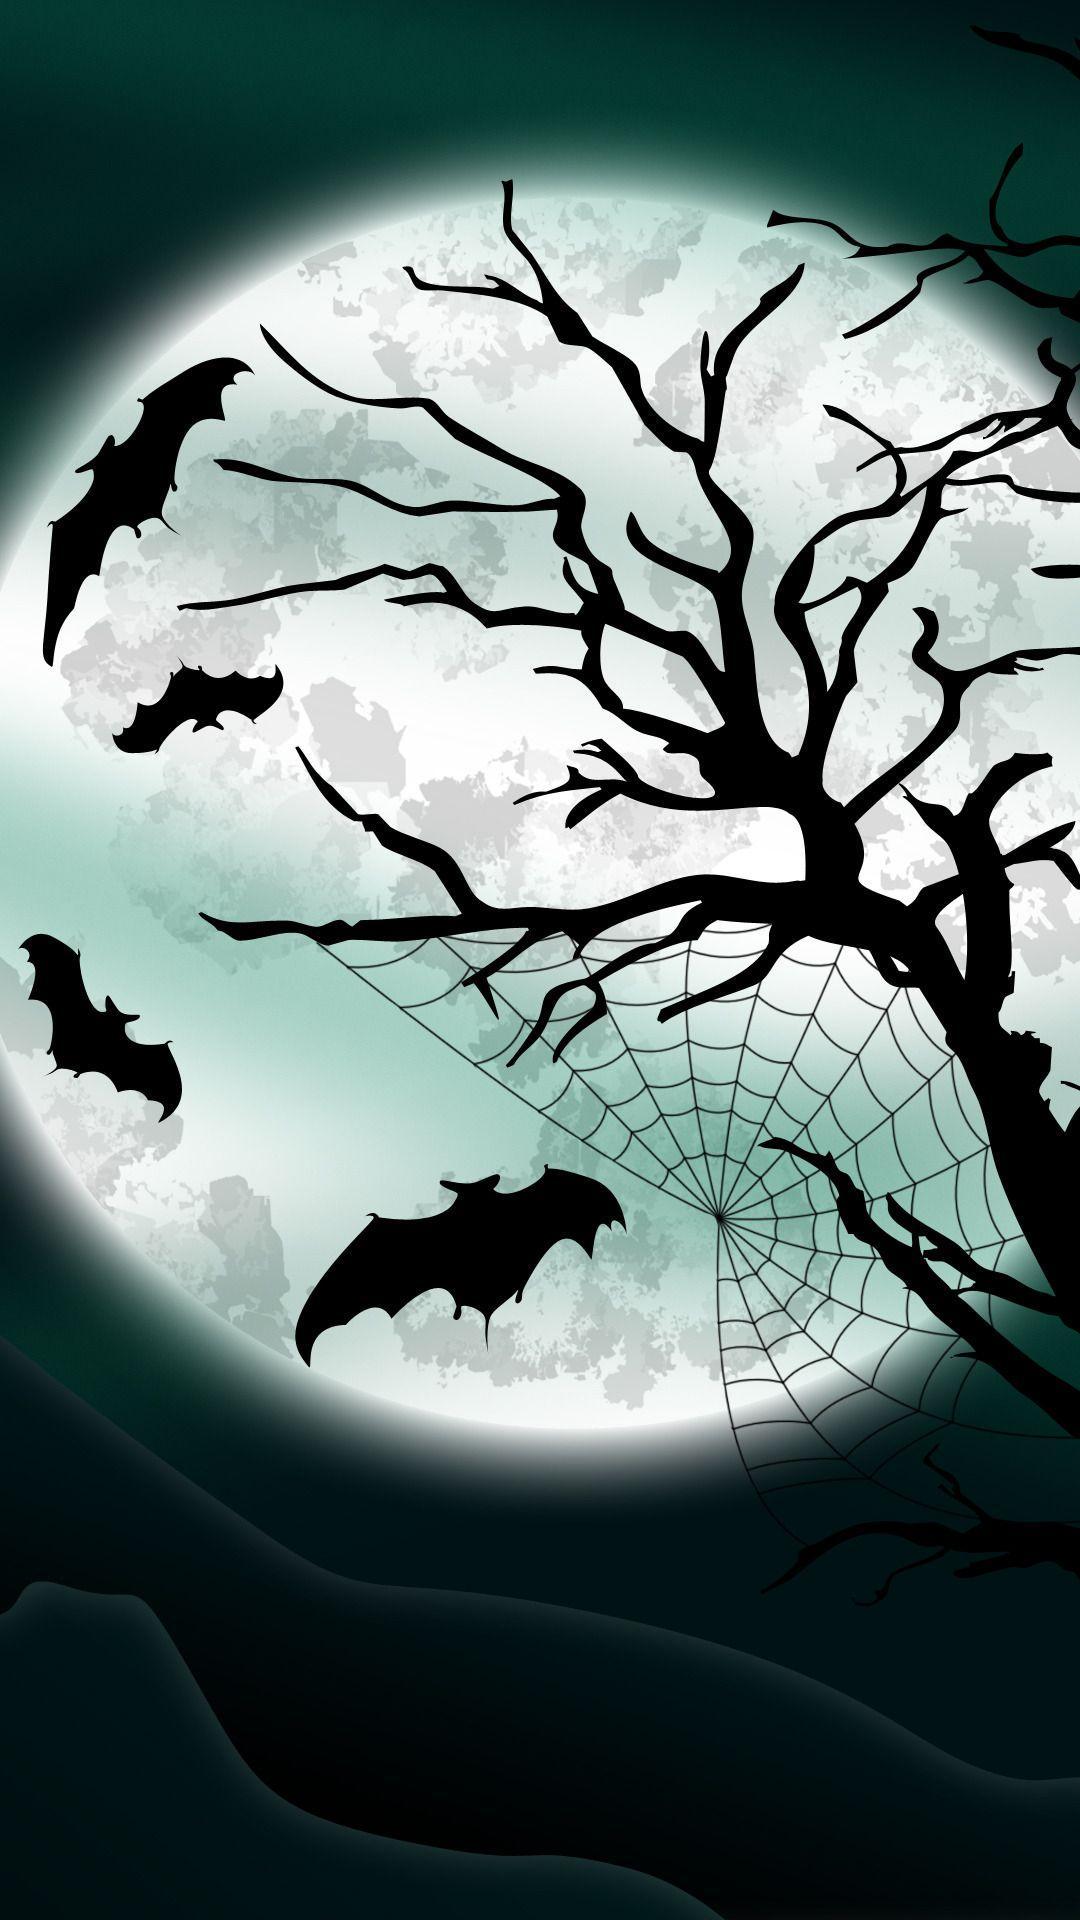 Halloween Bat Wallpapers Wallpaper Cave